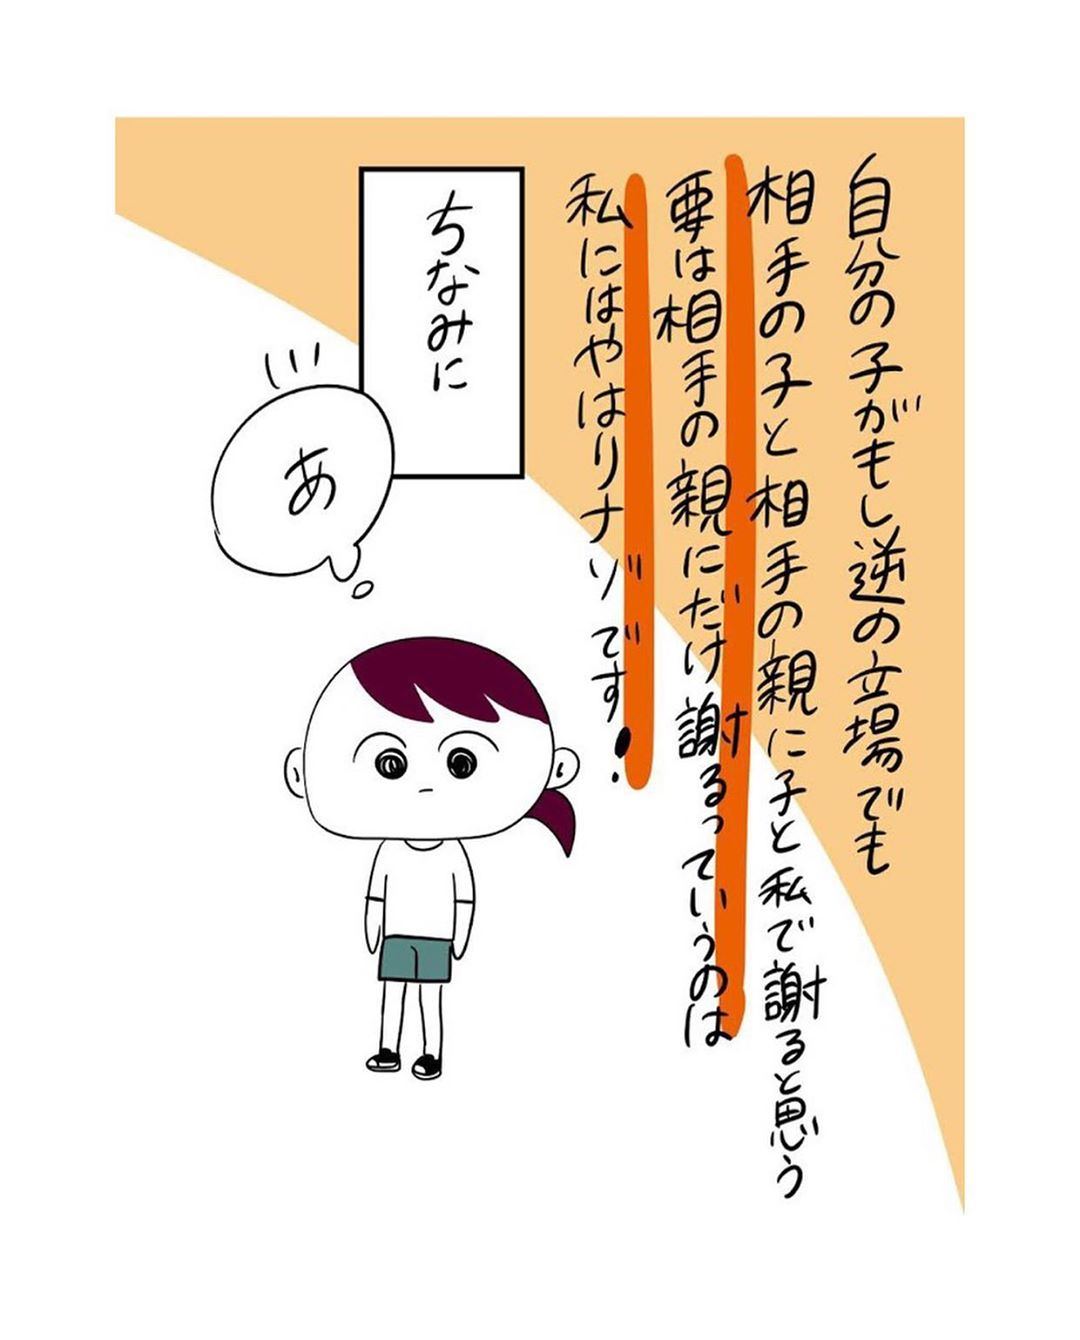 shirota.yunya_72871007_218721472454625_6752502626029976587_n